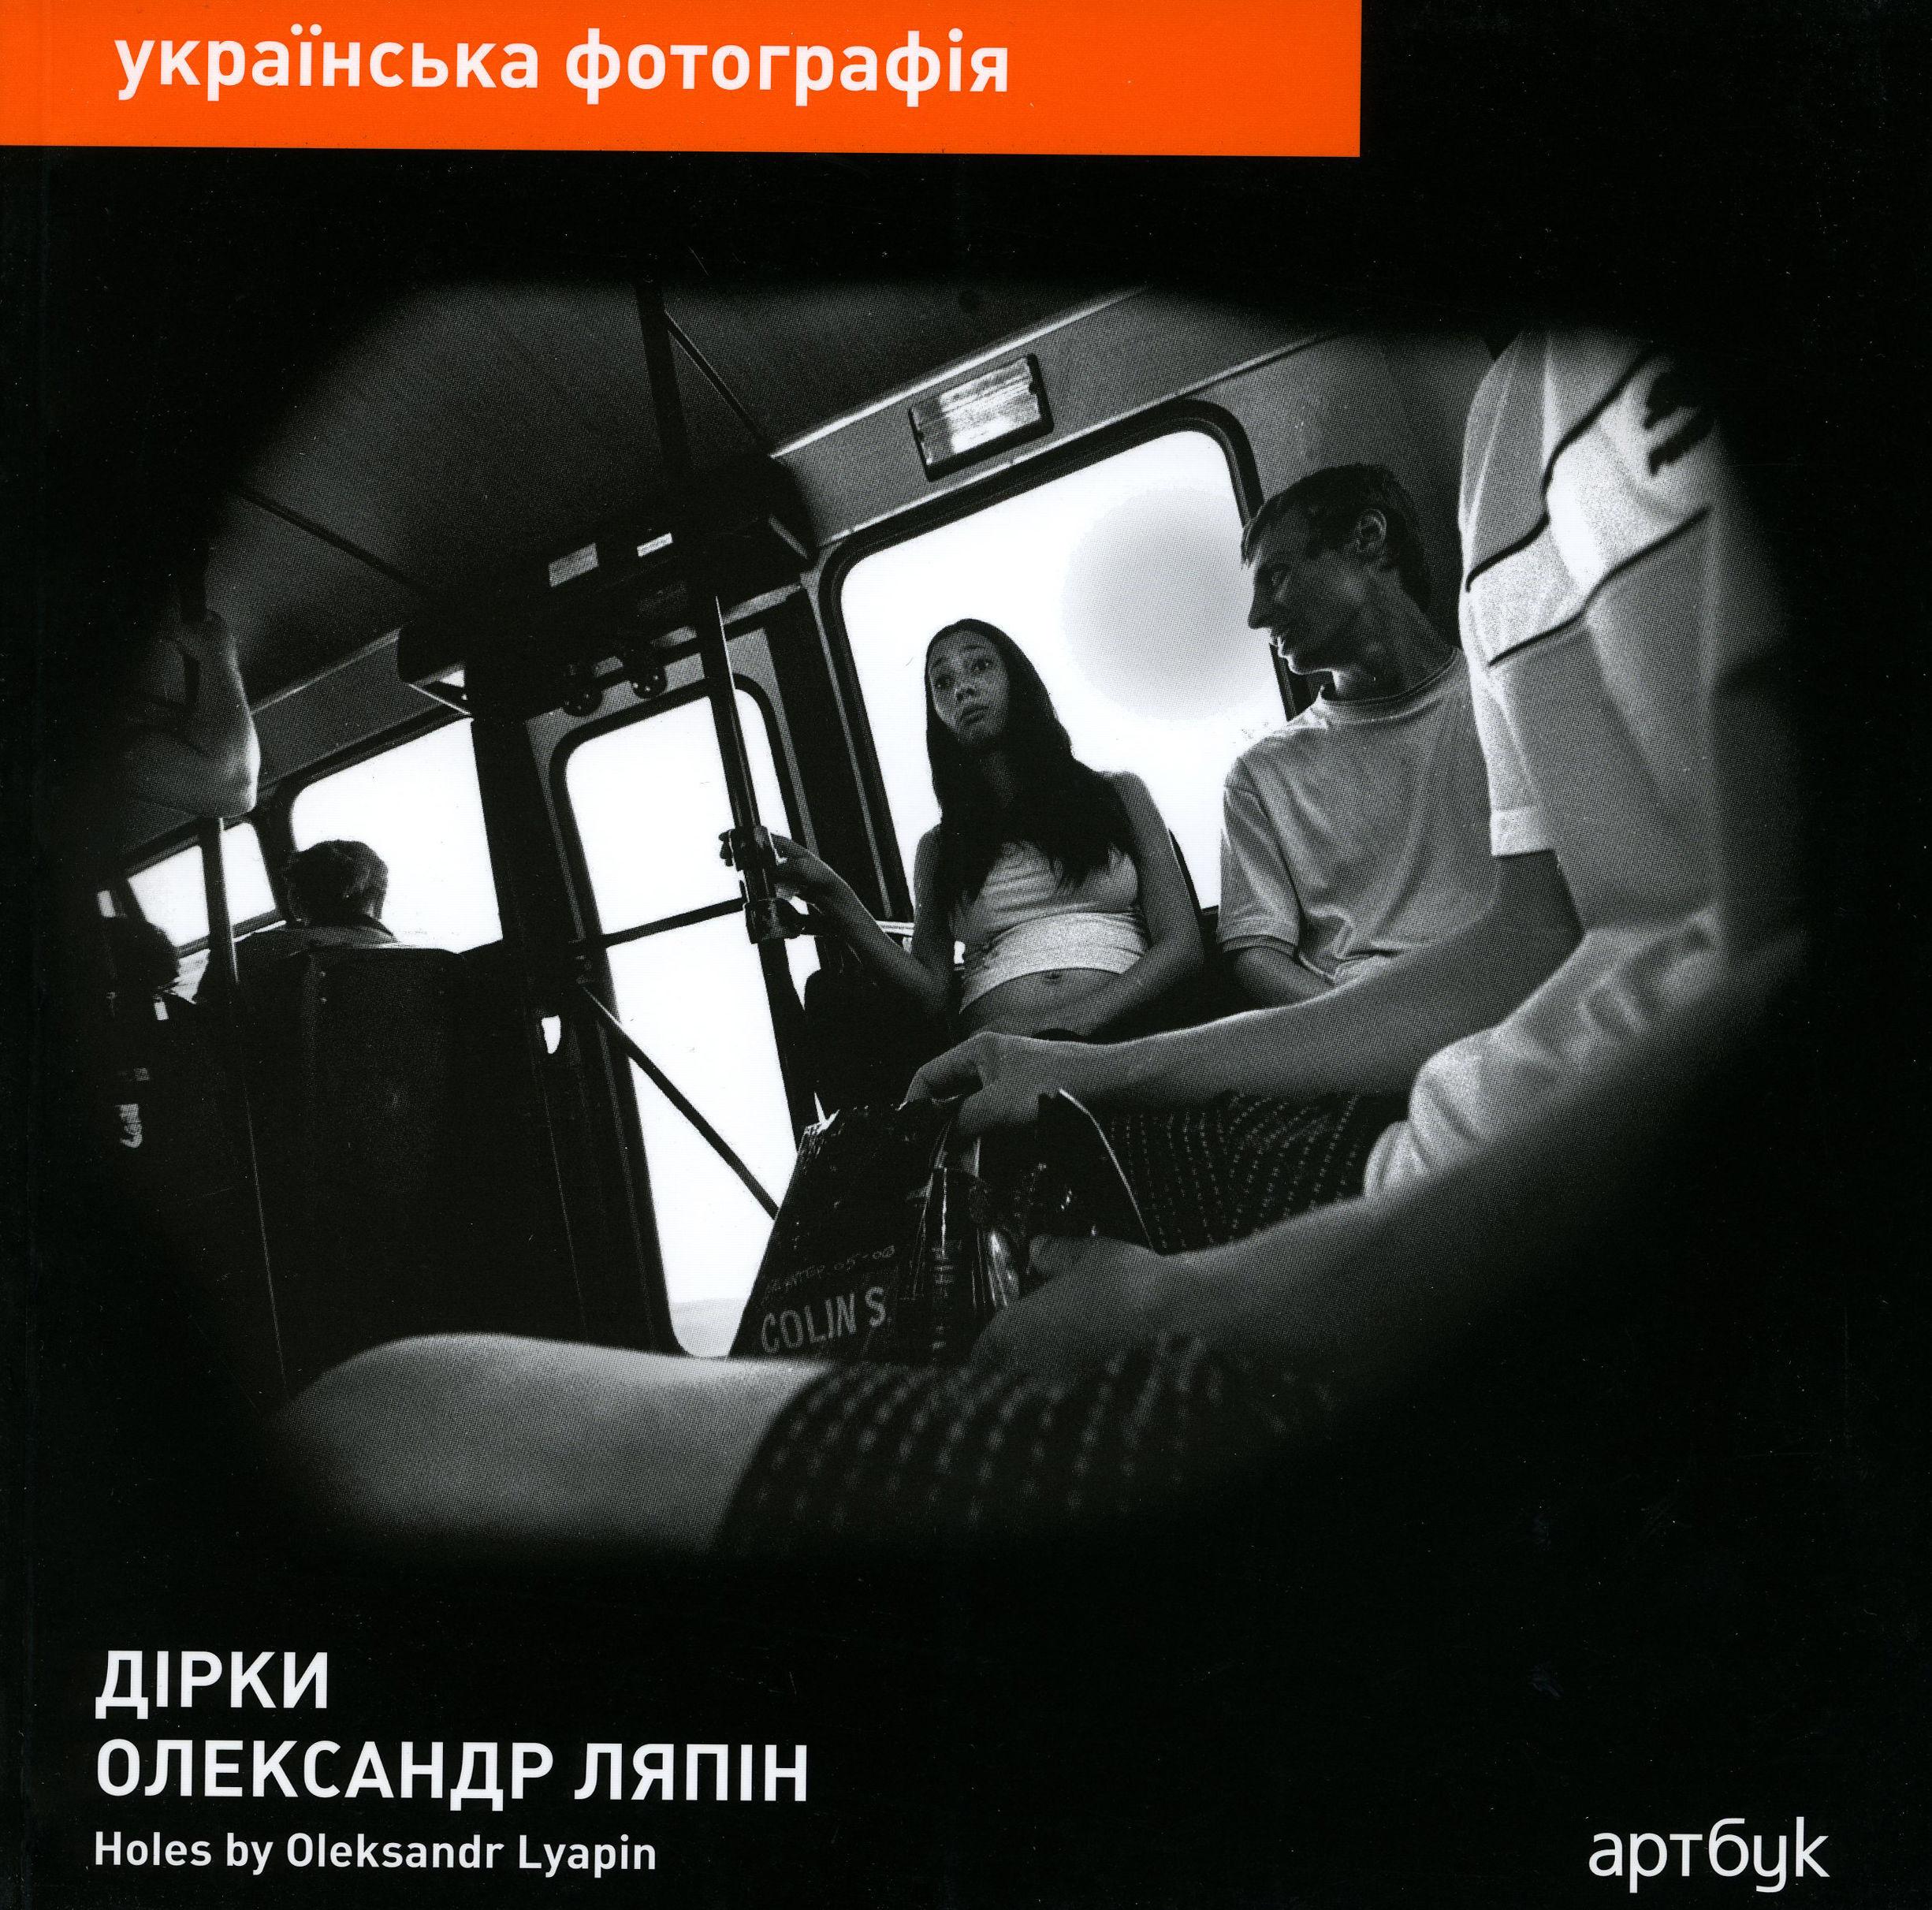 Олександр Ляпін. Дірки